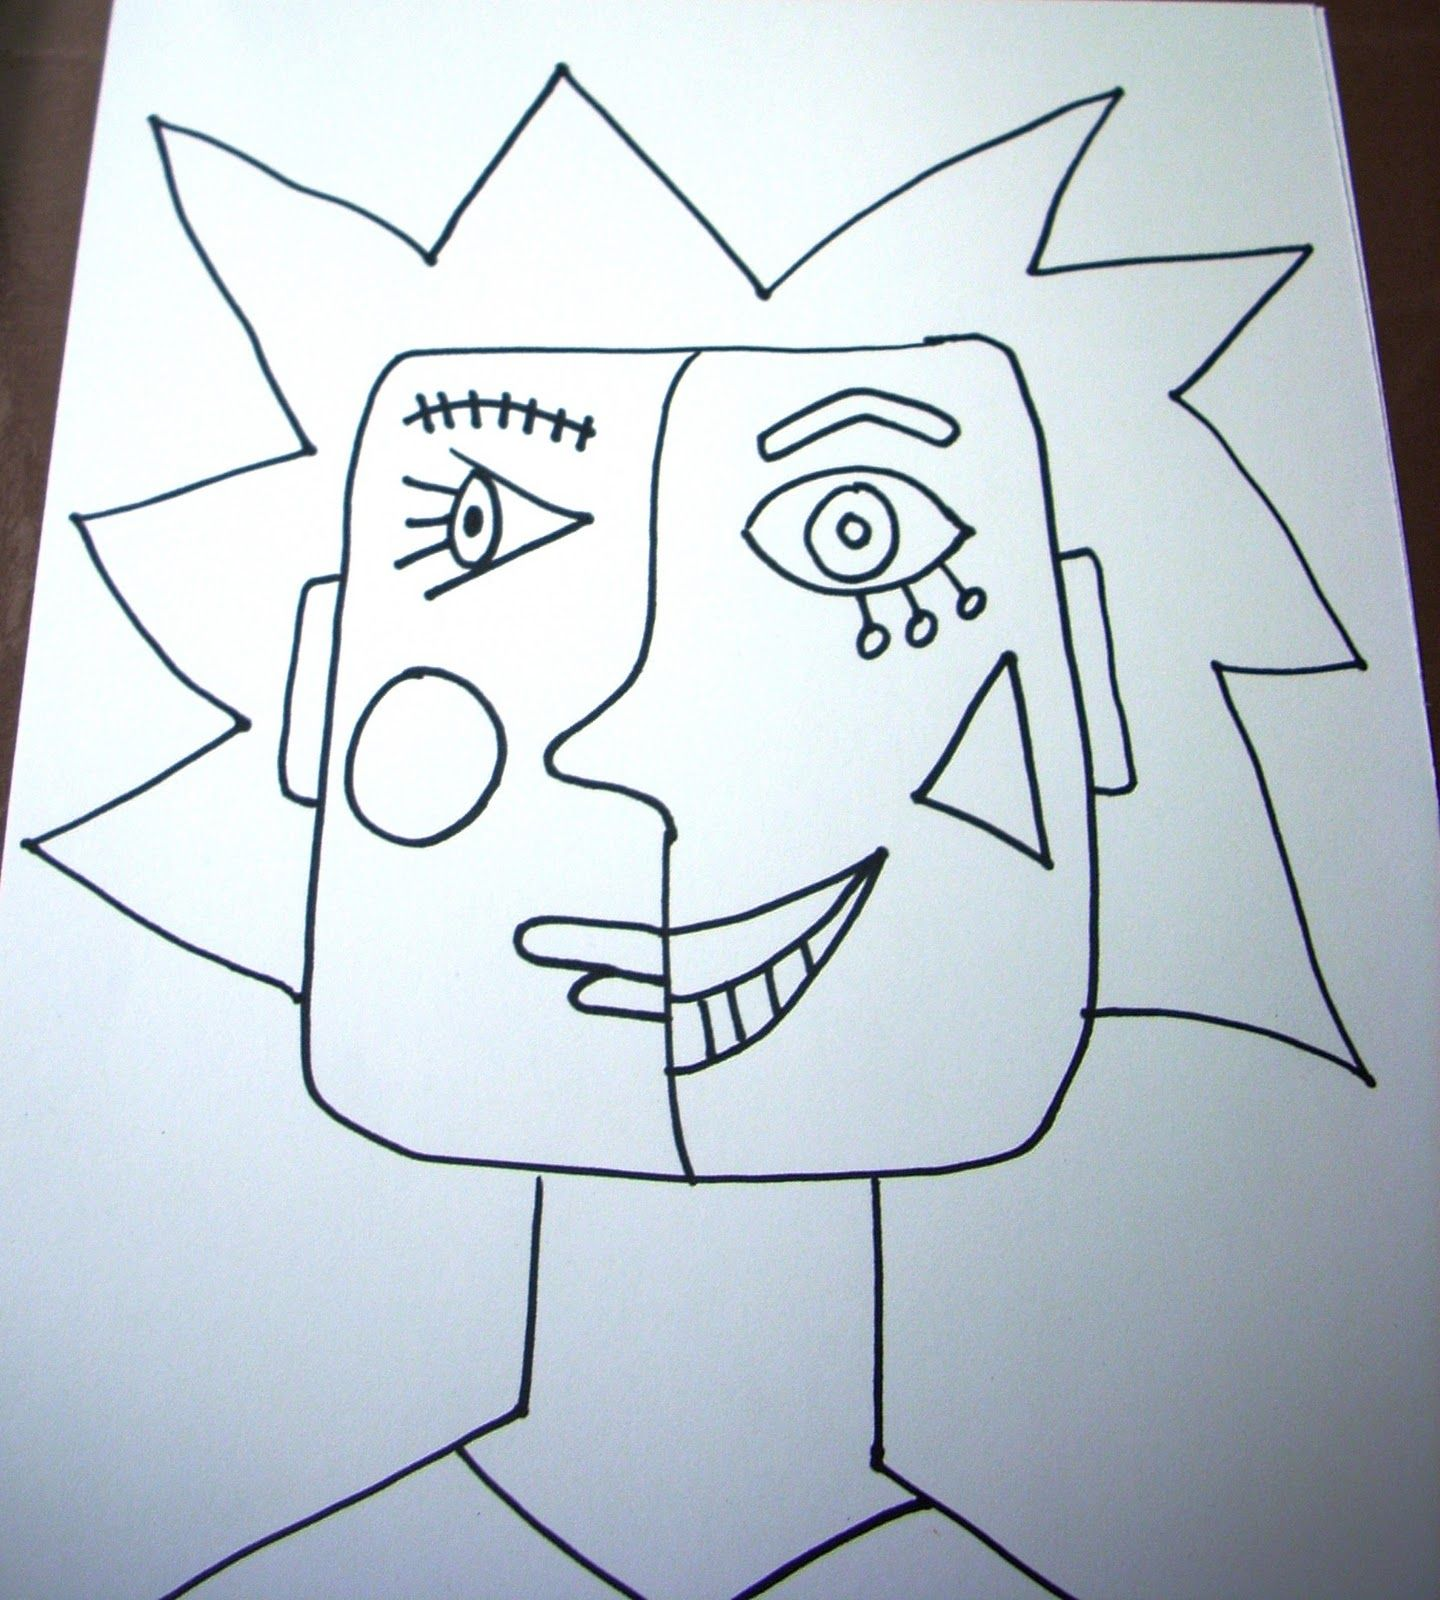 Pablo Picasso Cubism For Kids